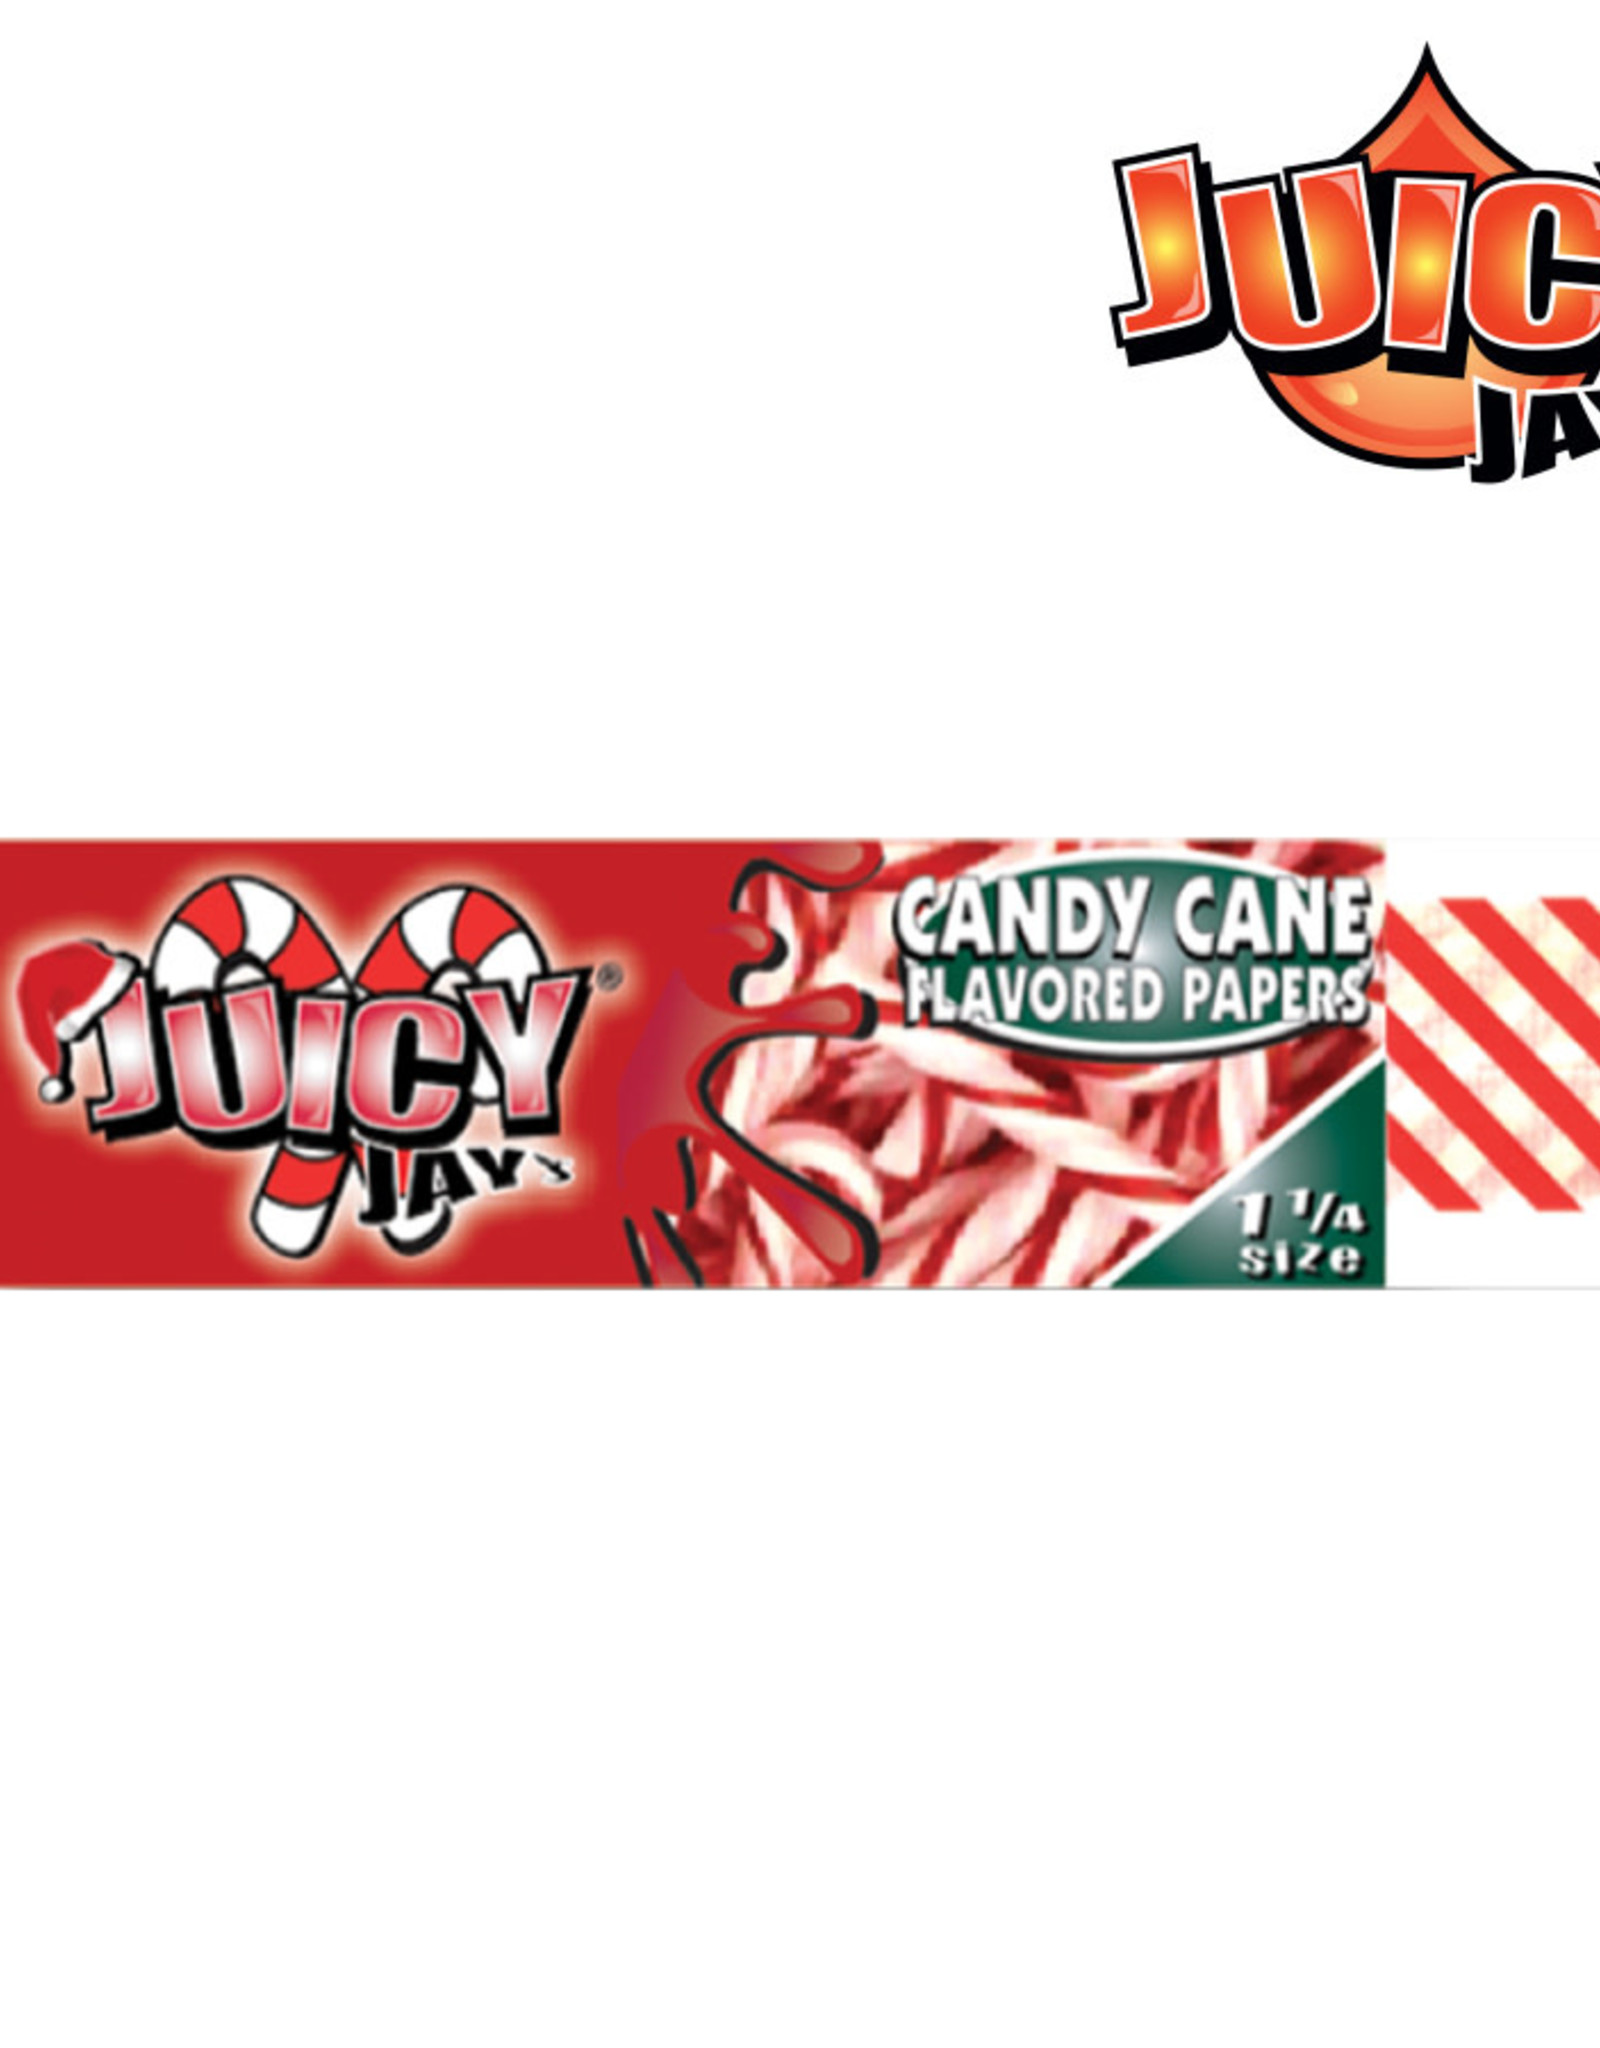 Juicy Jays's Juicy Jay Candy Cane 1 1/4